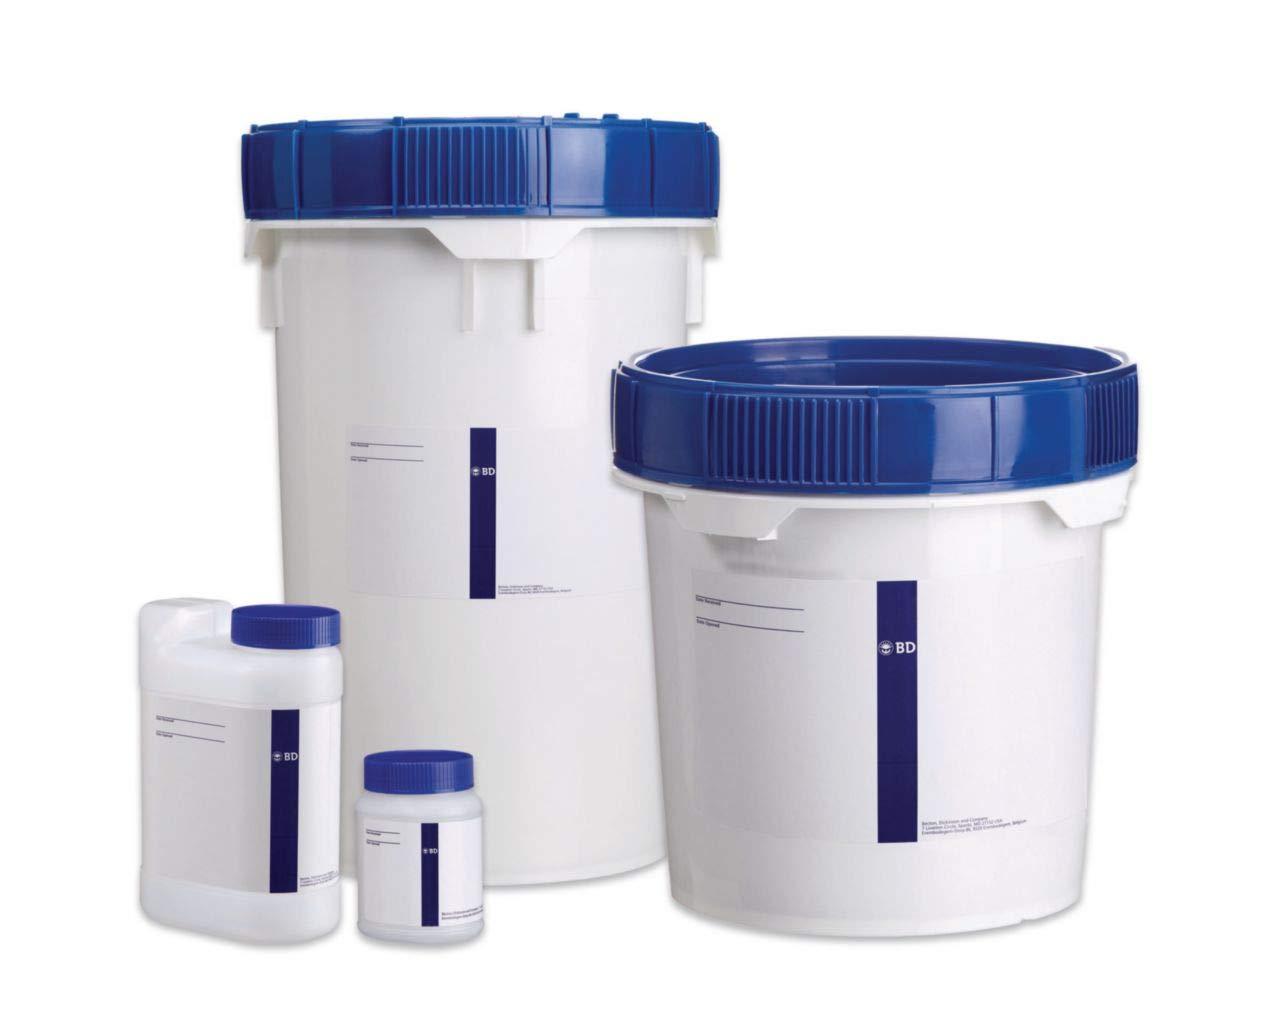 BD Diagnostic 211320 Difco Malt Extract Broth, 500 g